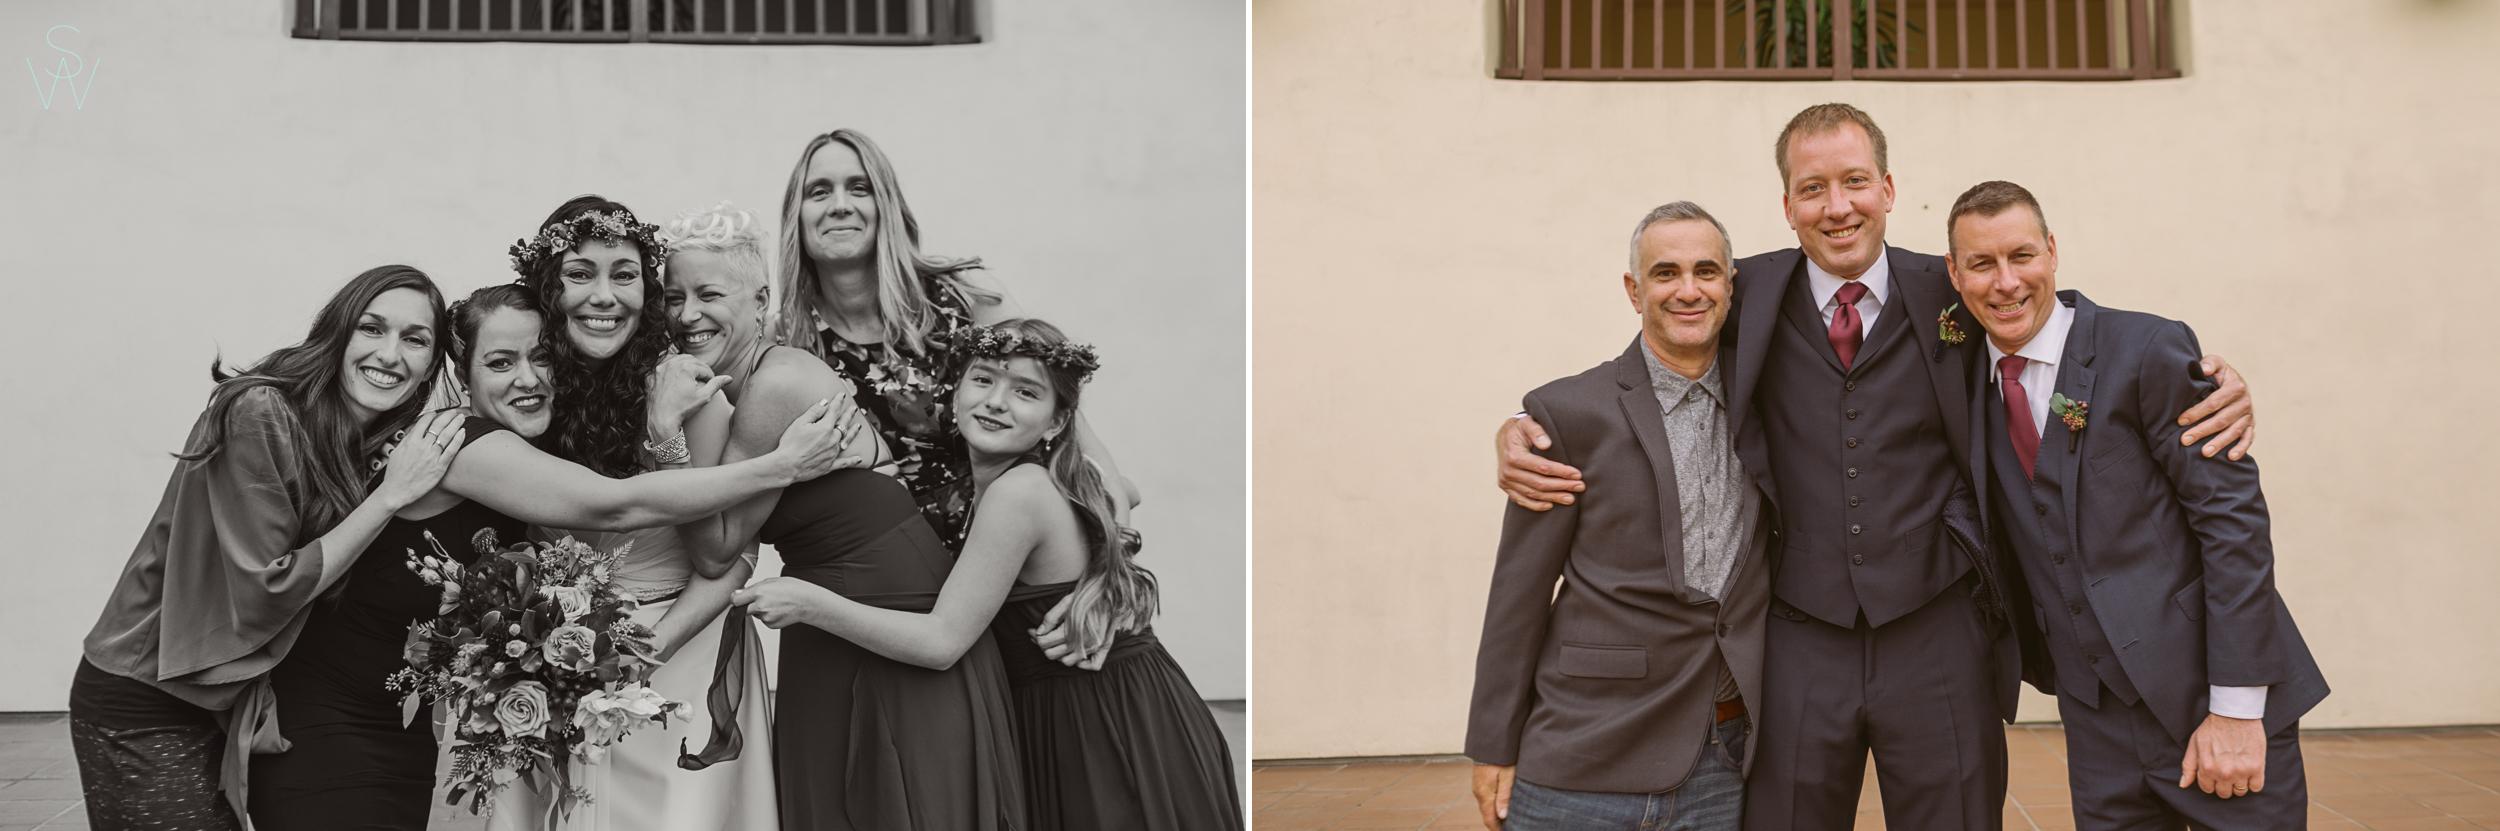 152Estancia.Shewanders.Wedding.Family.portraits.Photography.JPG